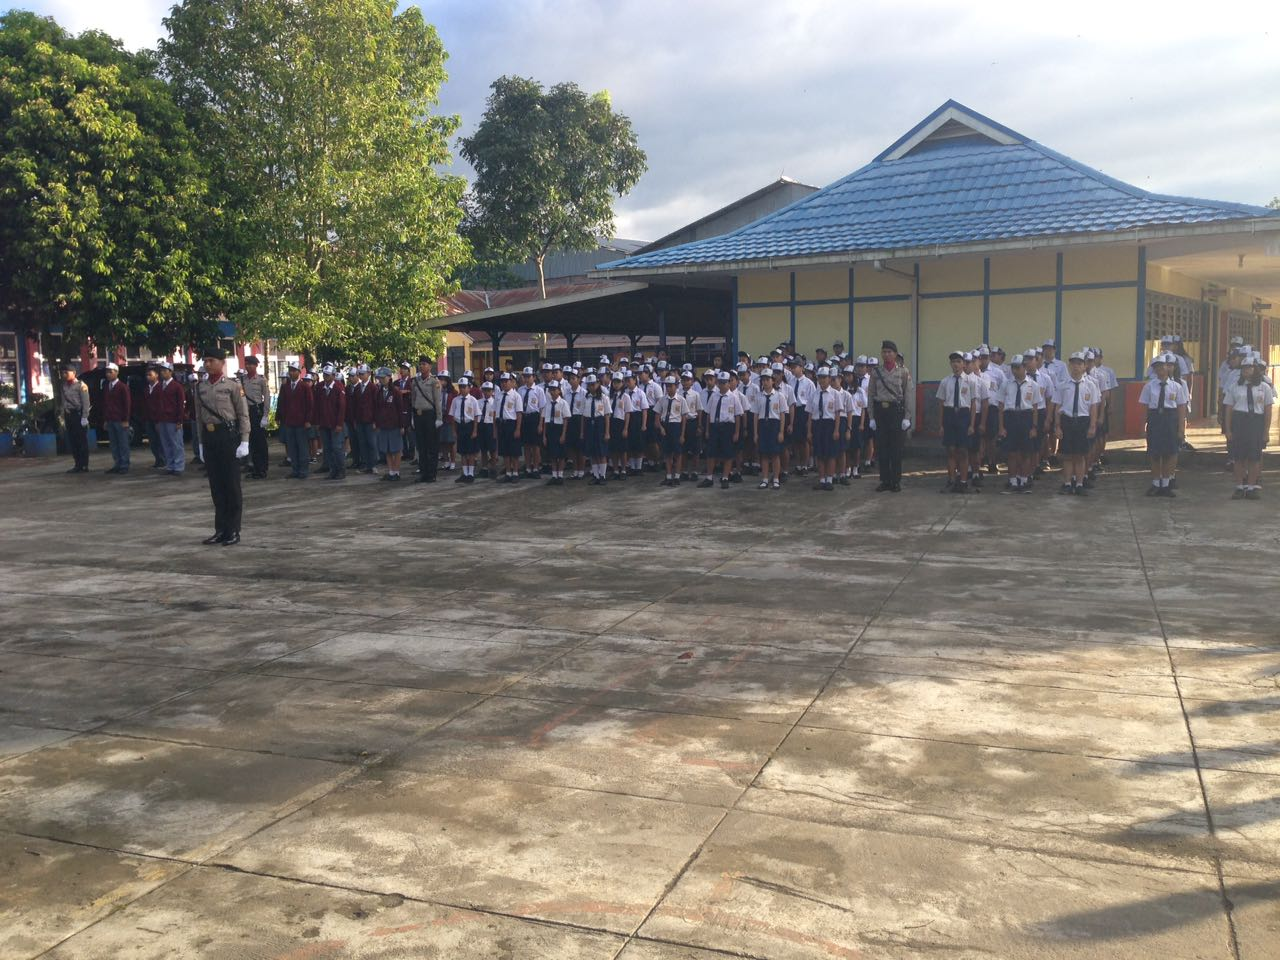 Sosialisasi Penerimaan Polri, Siswa SPN Bukit Kaba Upacara Disekolah